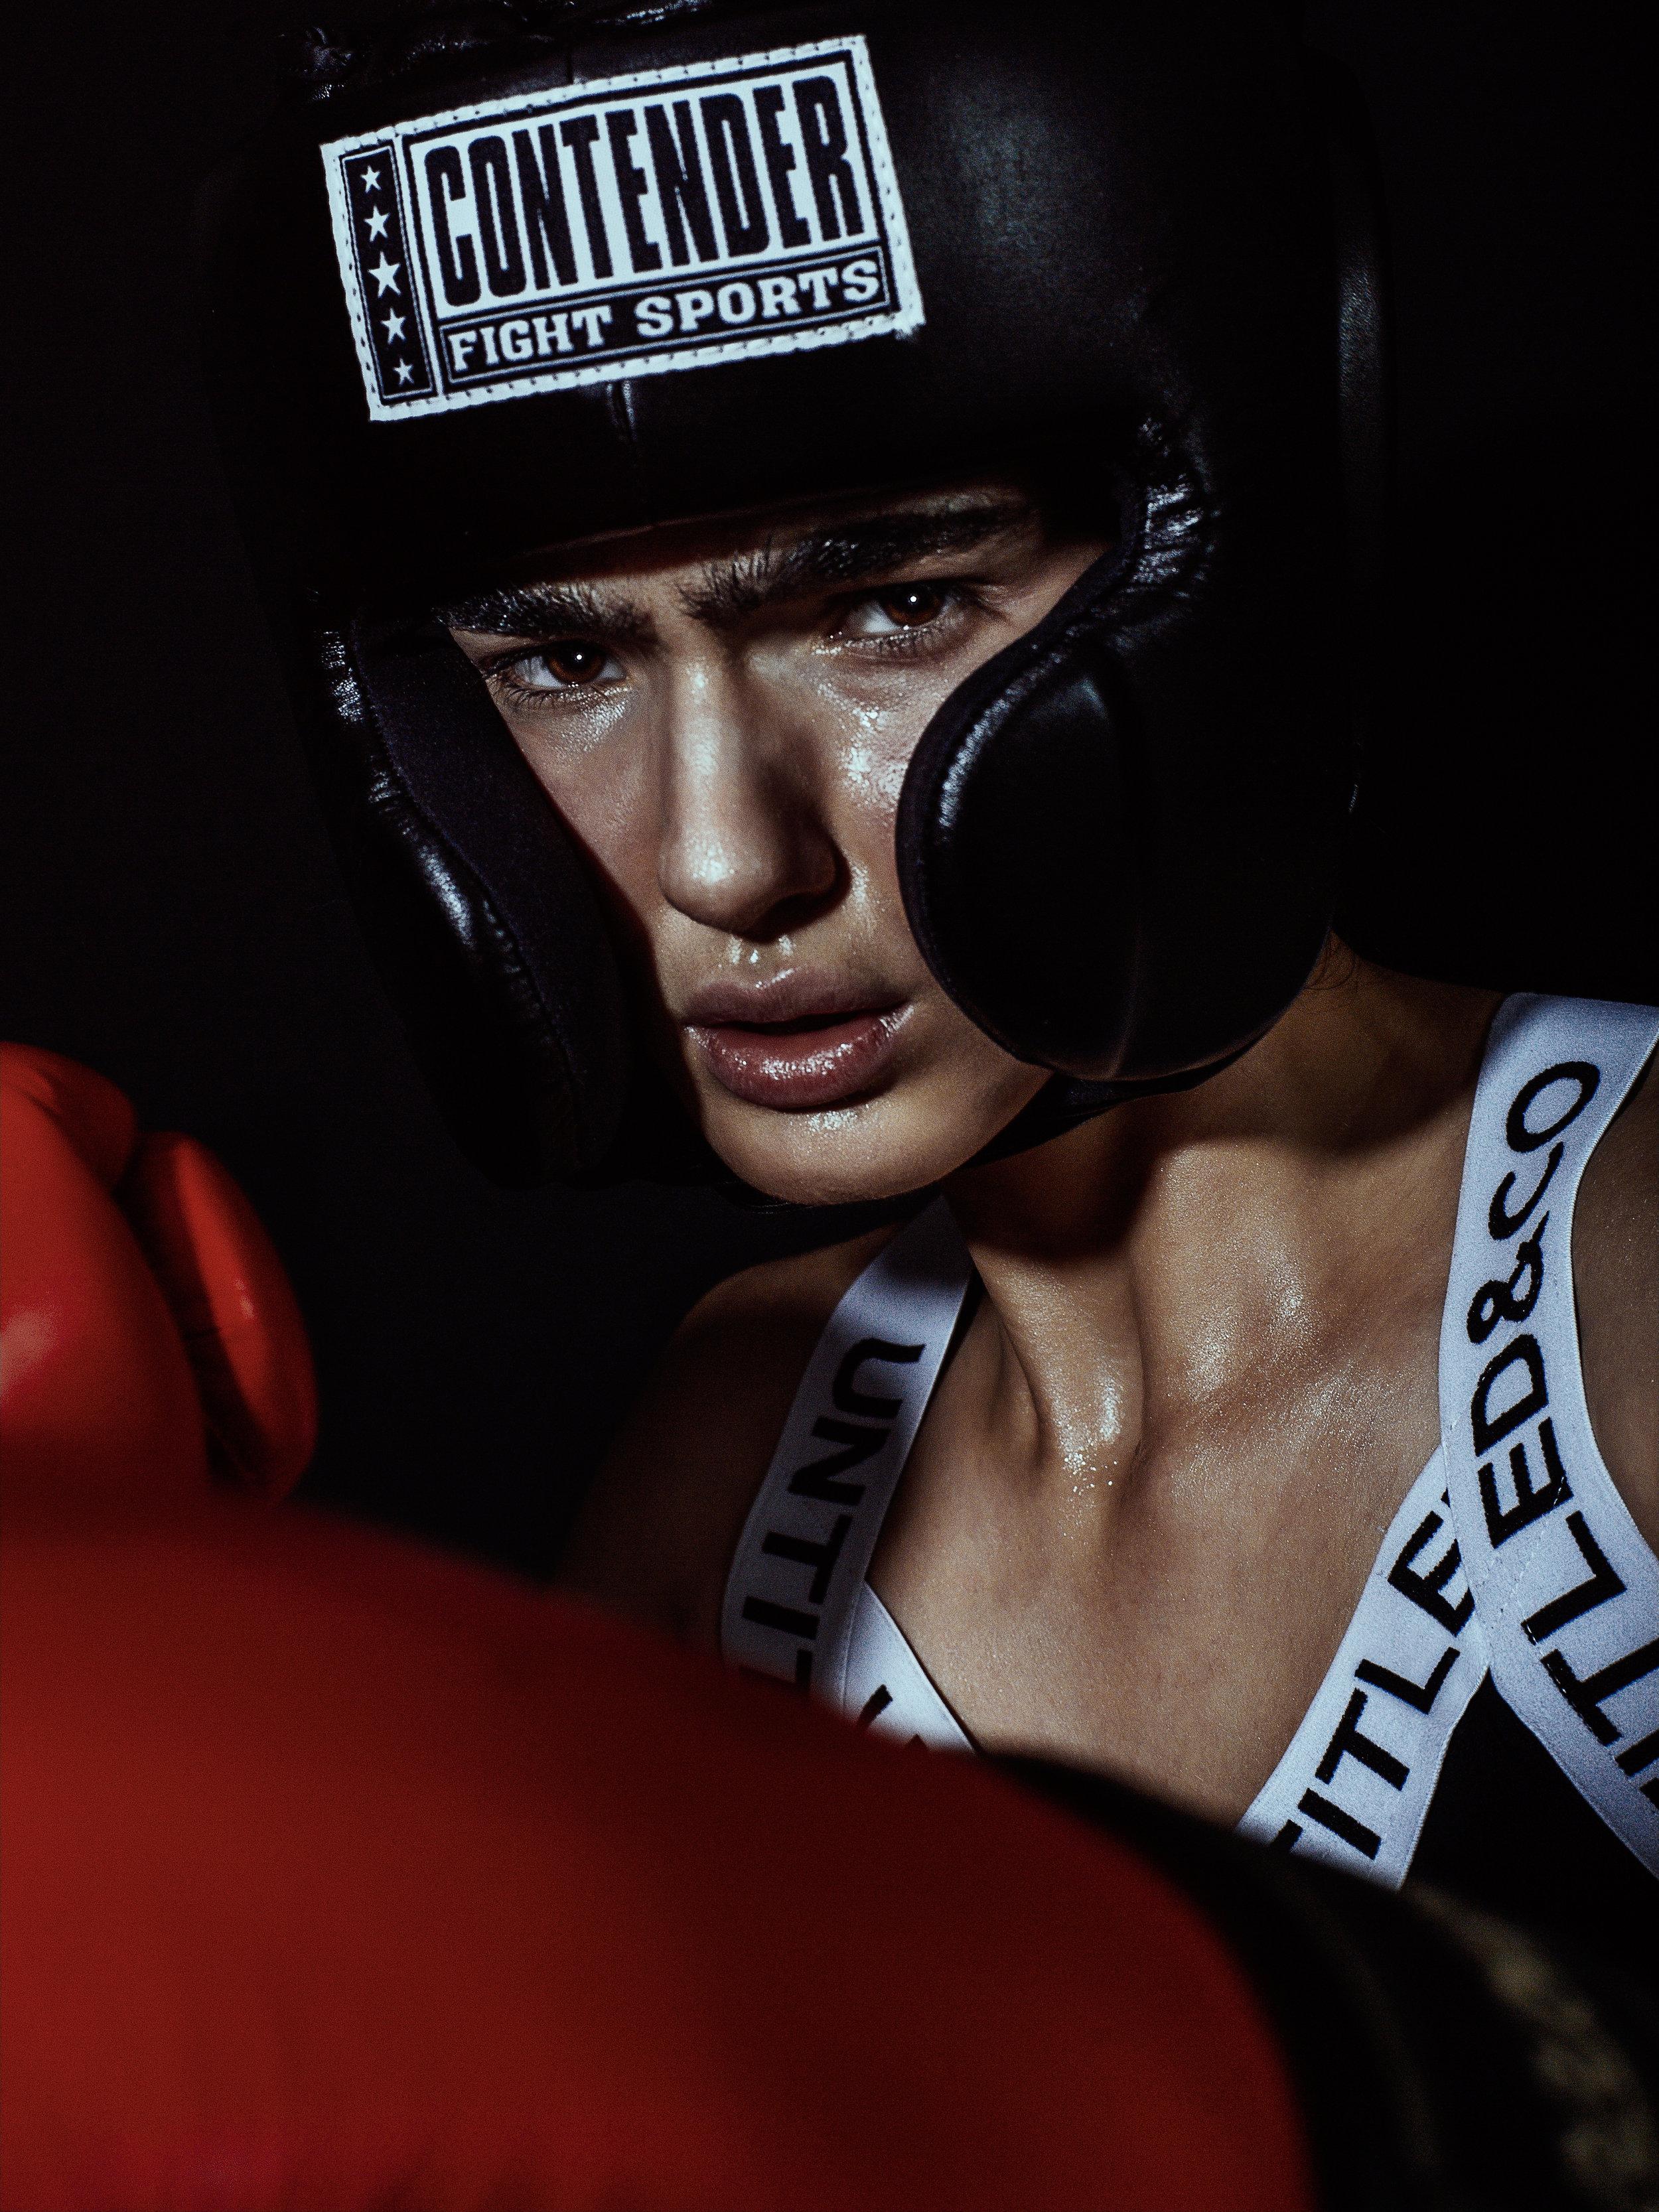 Roberto_Vazquez_boxing0002.jpg